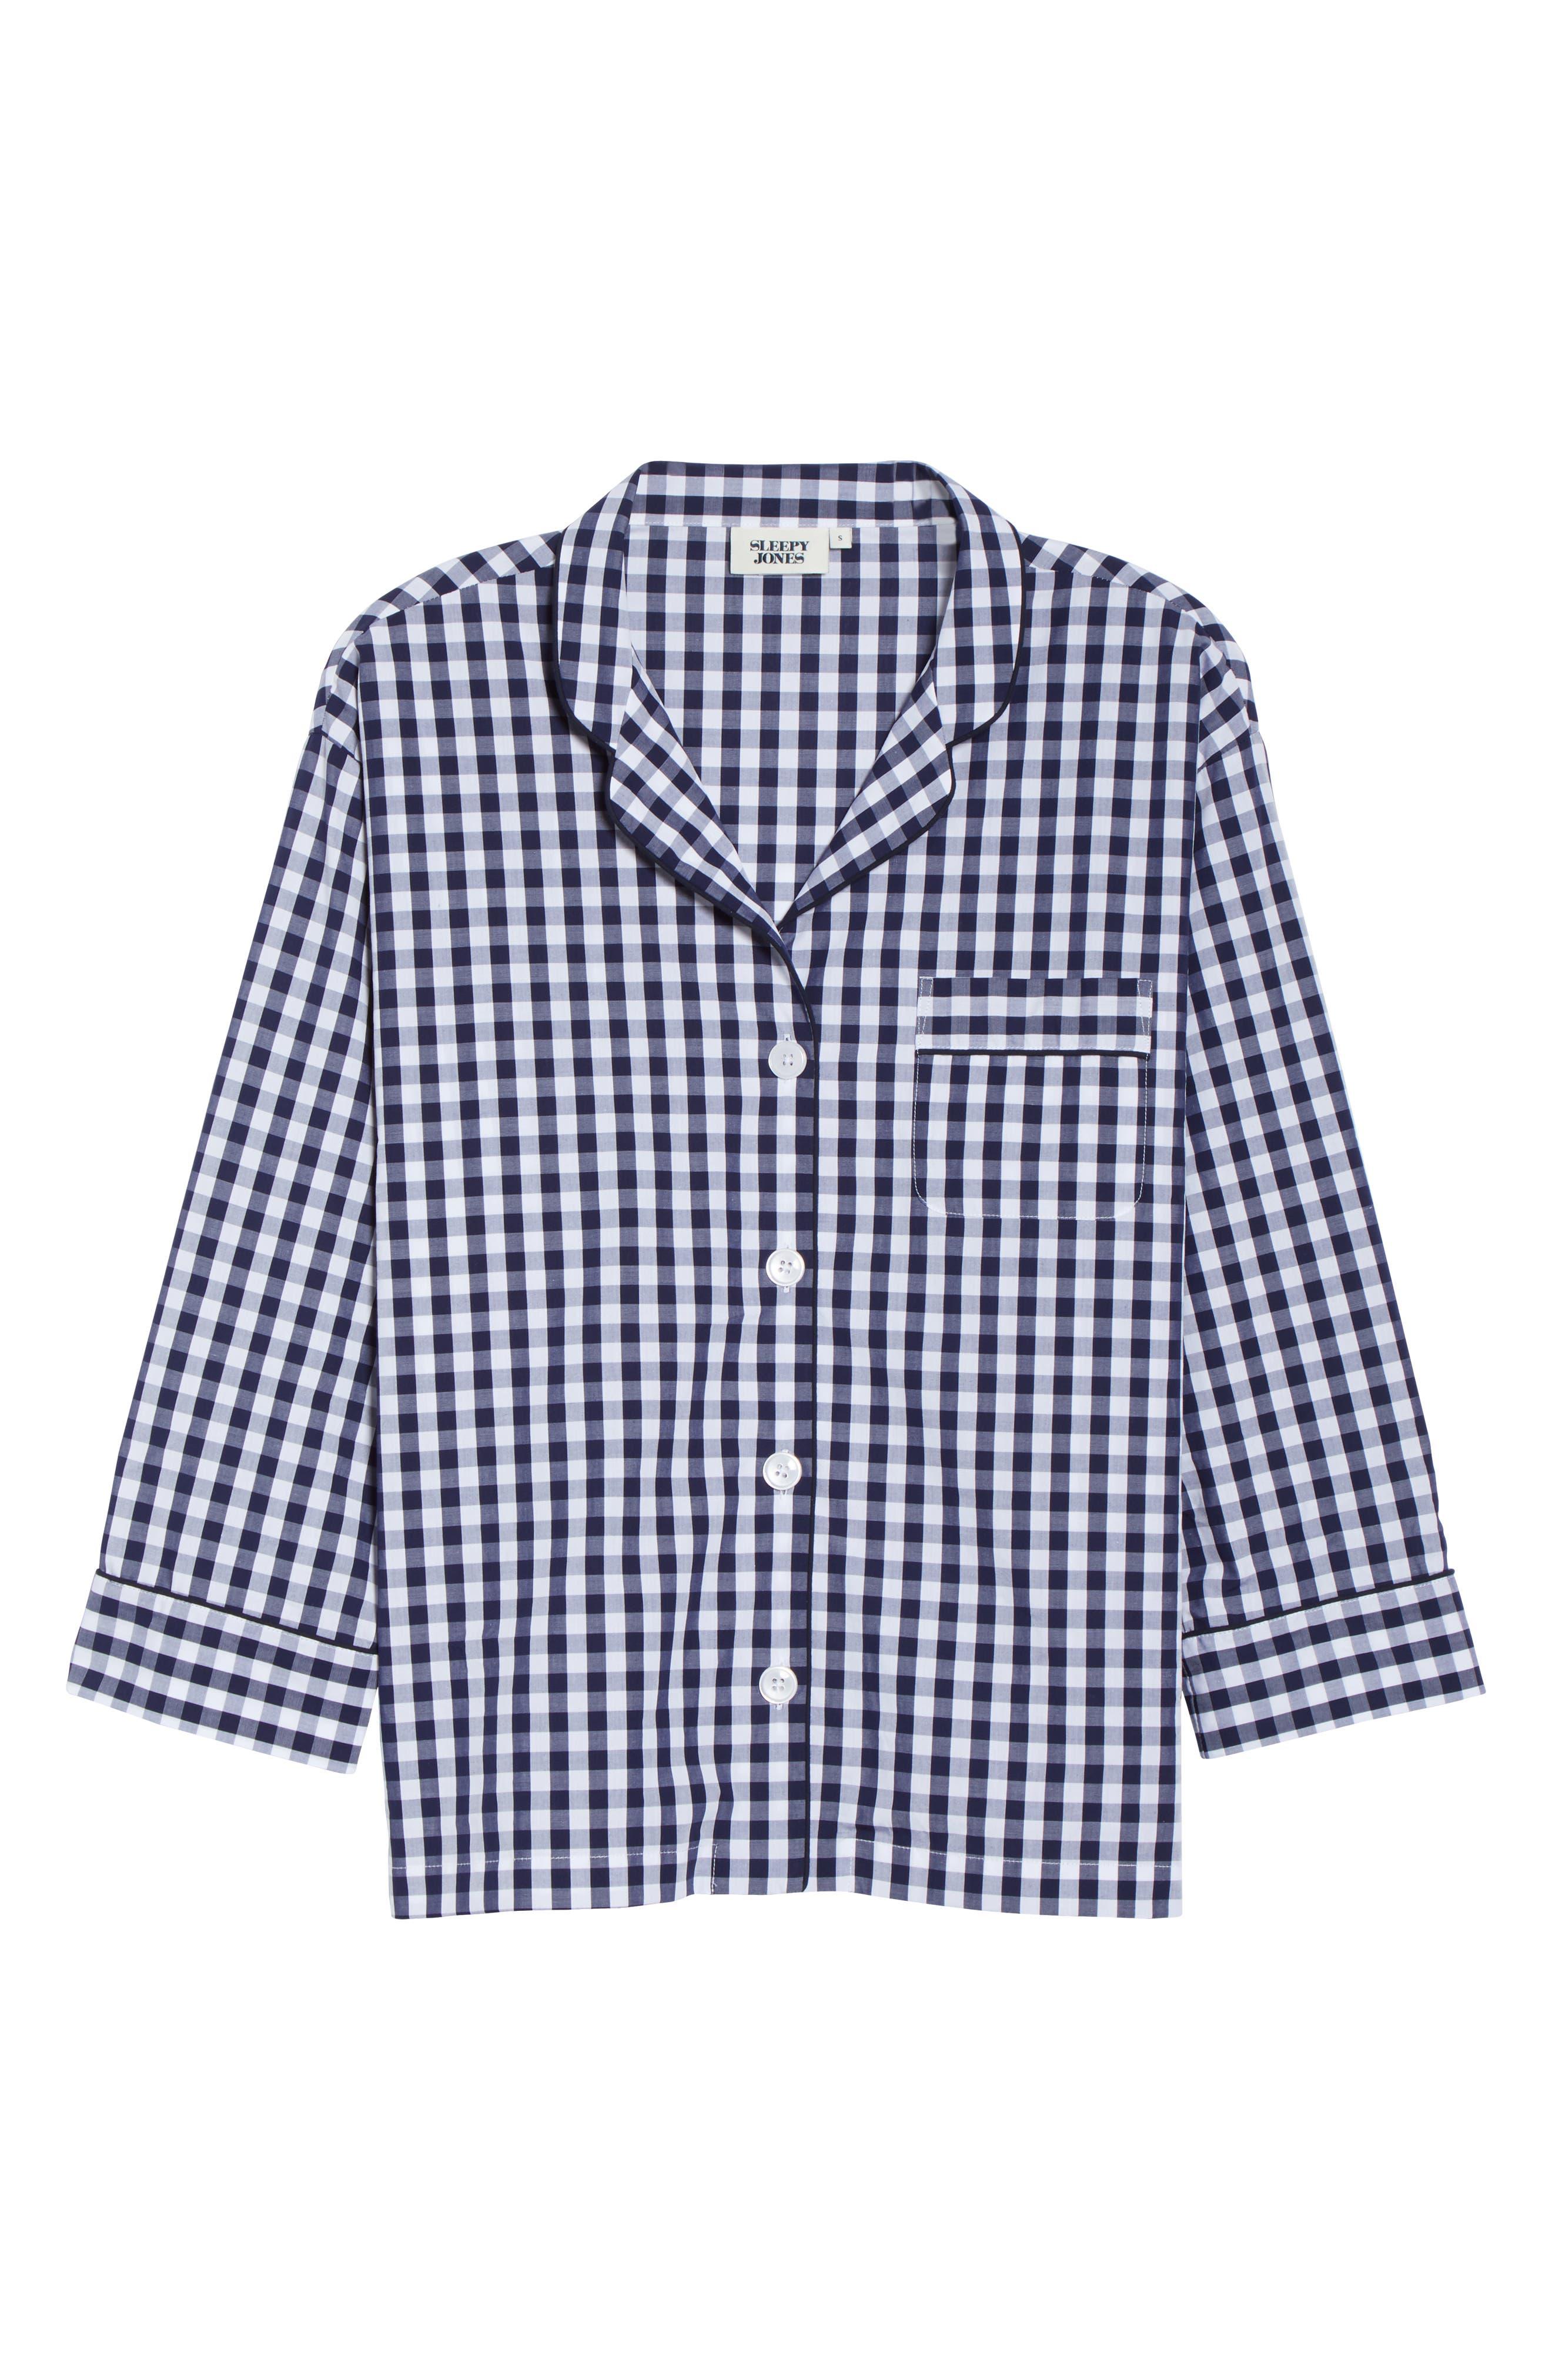 Sleepy Jones Marina Pajama Shirt, Blue